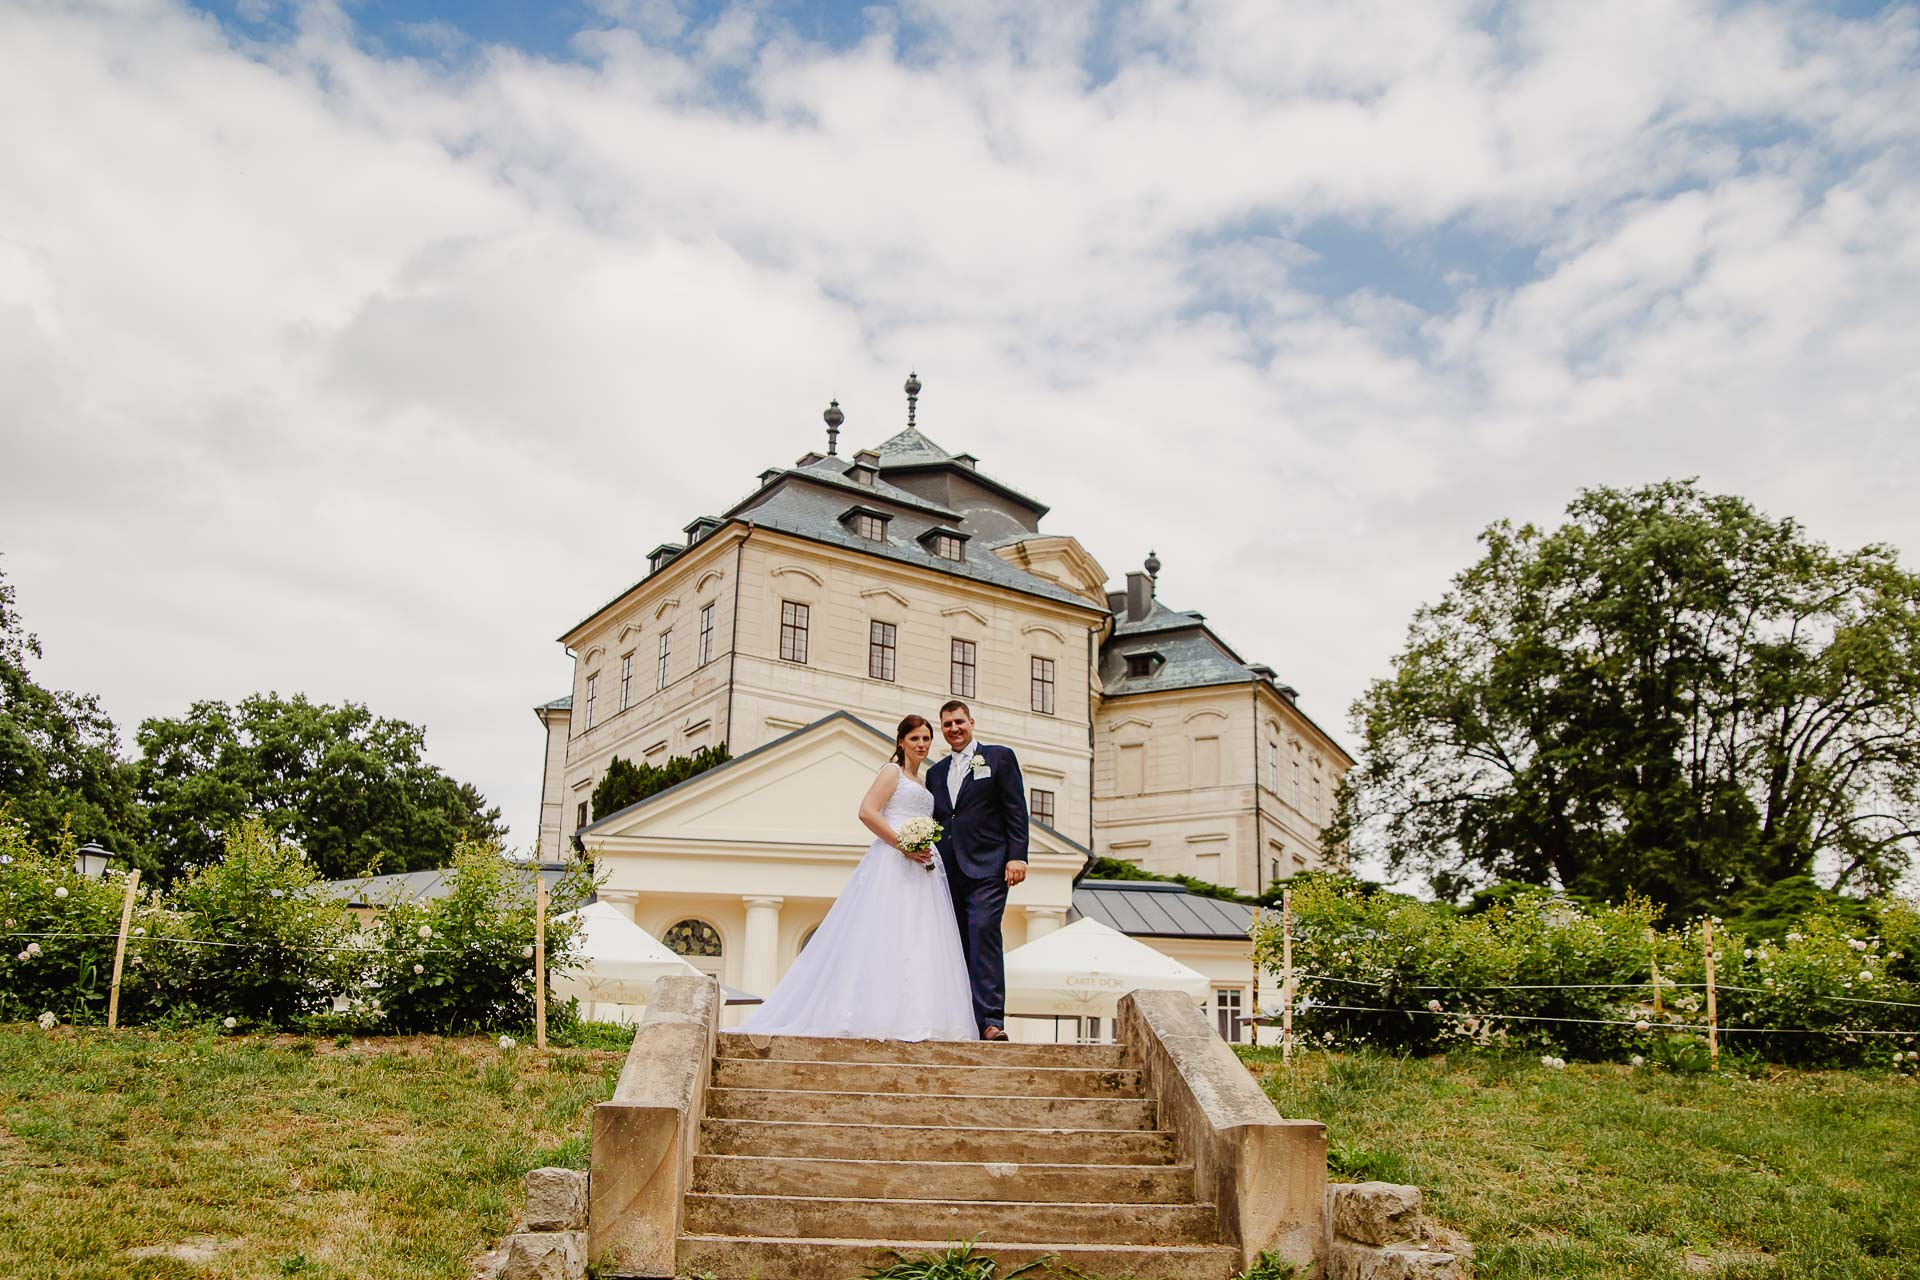 Svatební-fotograf-zámek-Karlova-Koruna-Chlumec-nad-Cidlinou-162